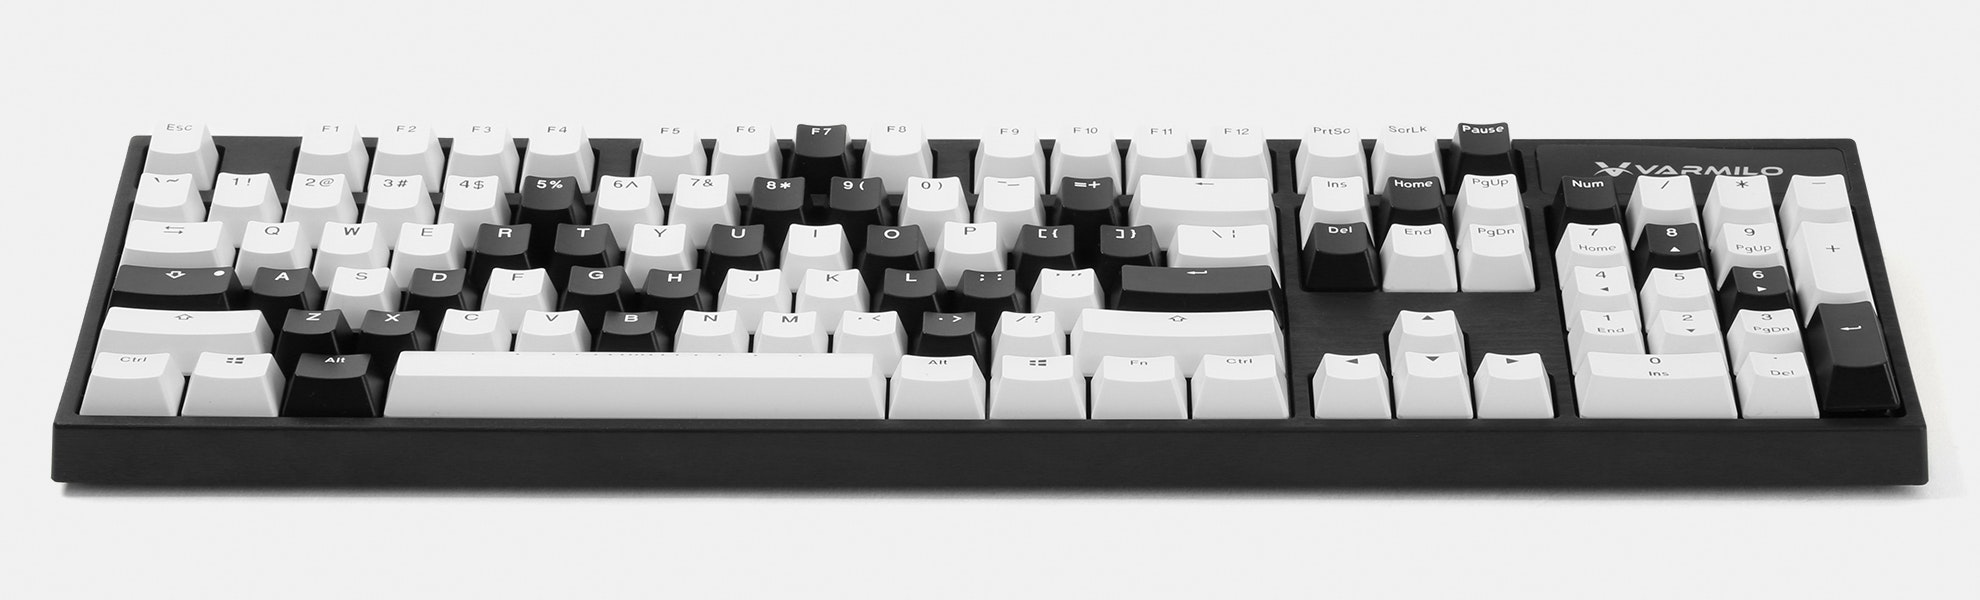 Varmilo 10th Anniversary Z104 Mechanical Keyboard